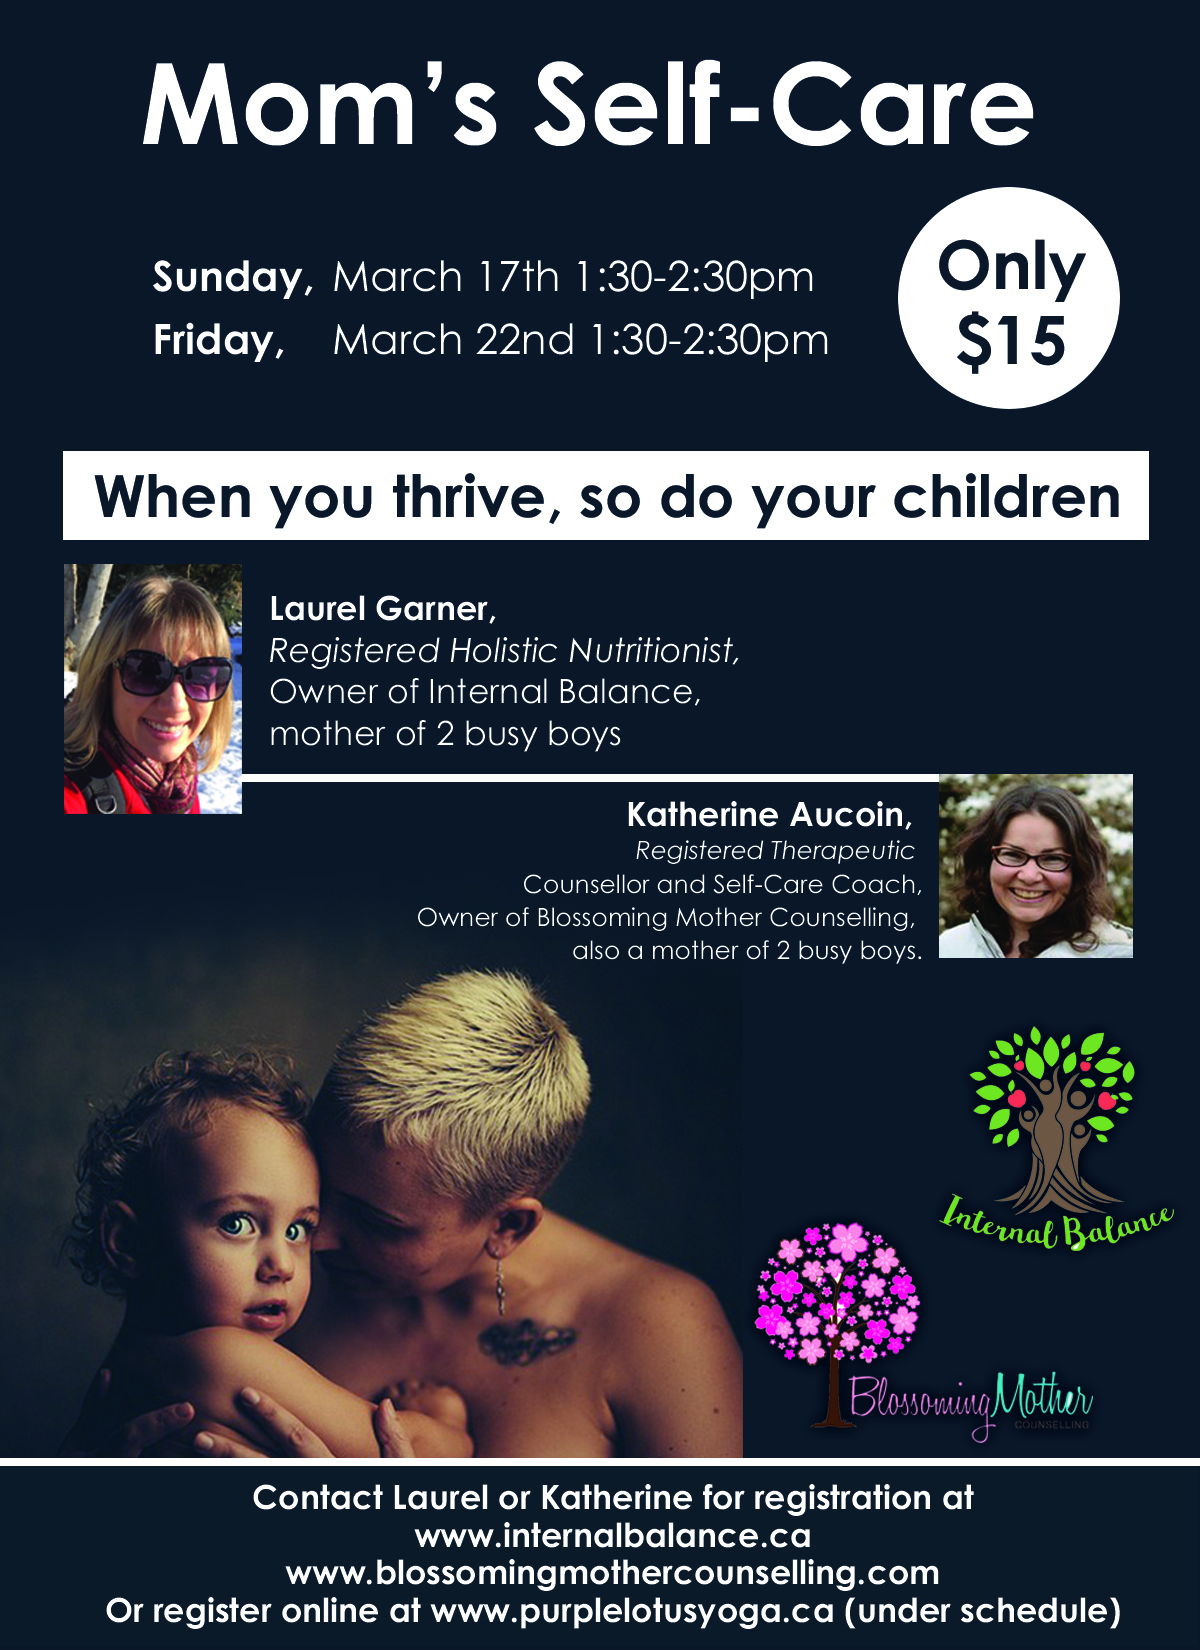 Moms self care Final poster.jpg